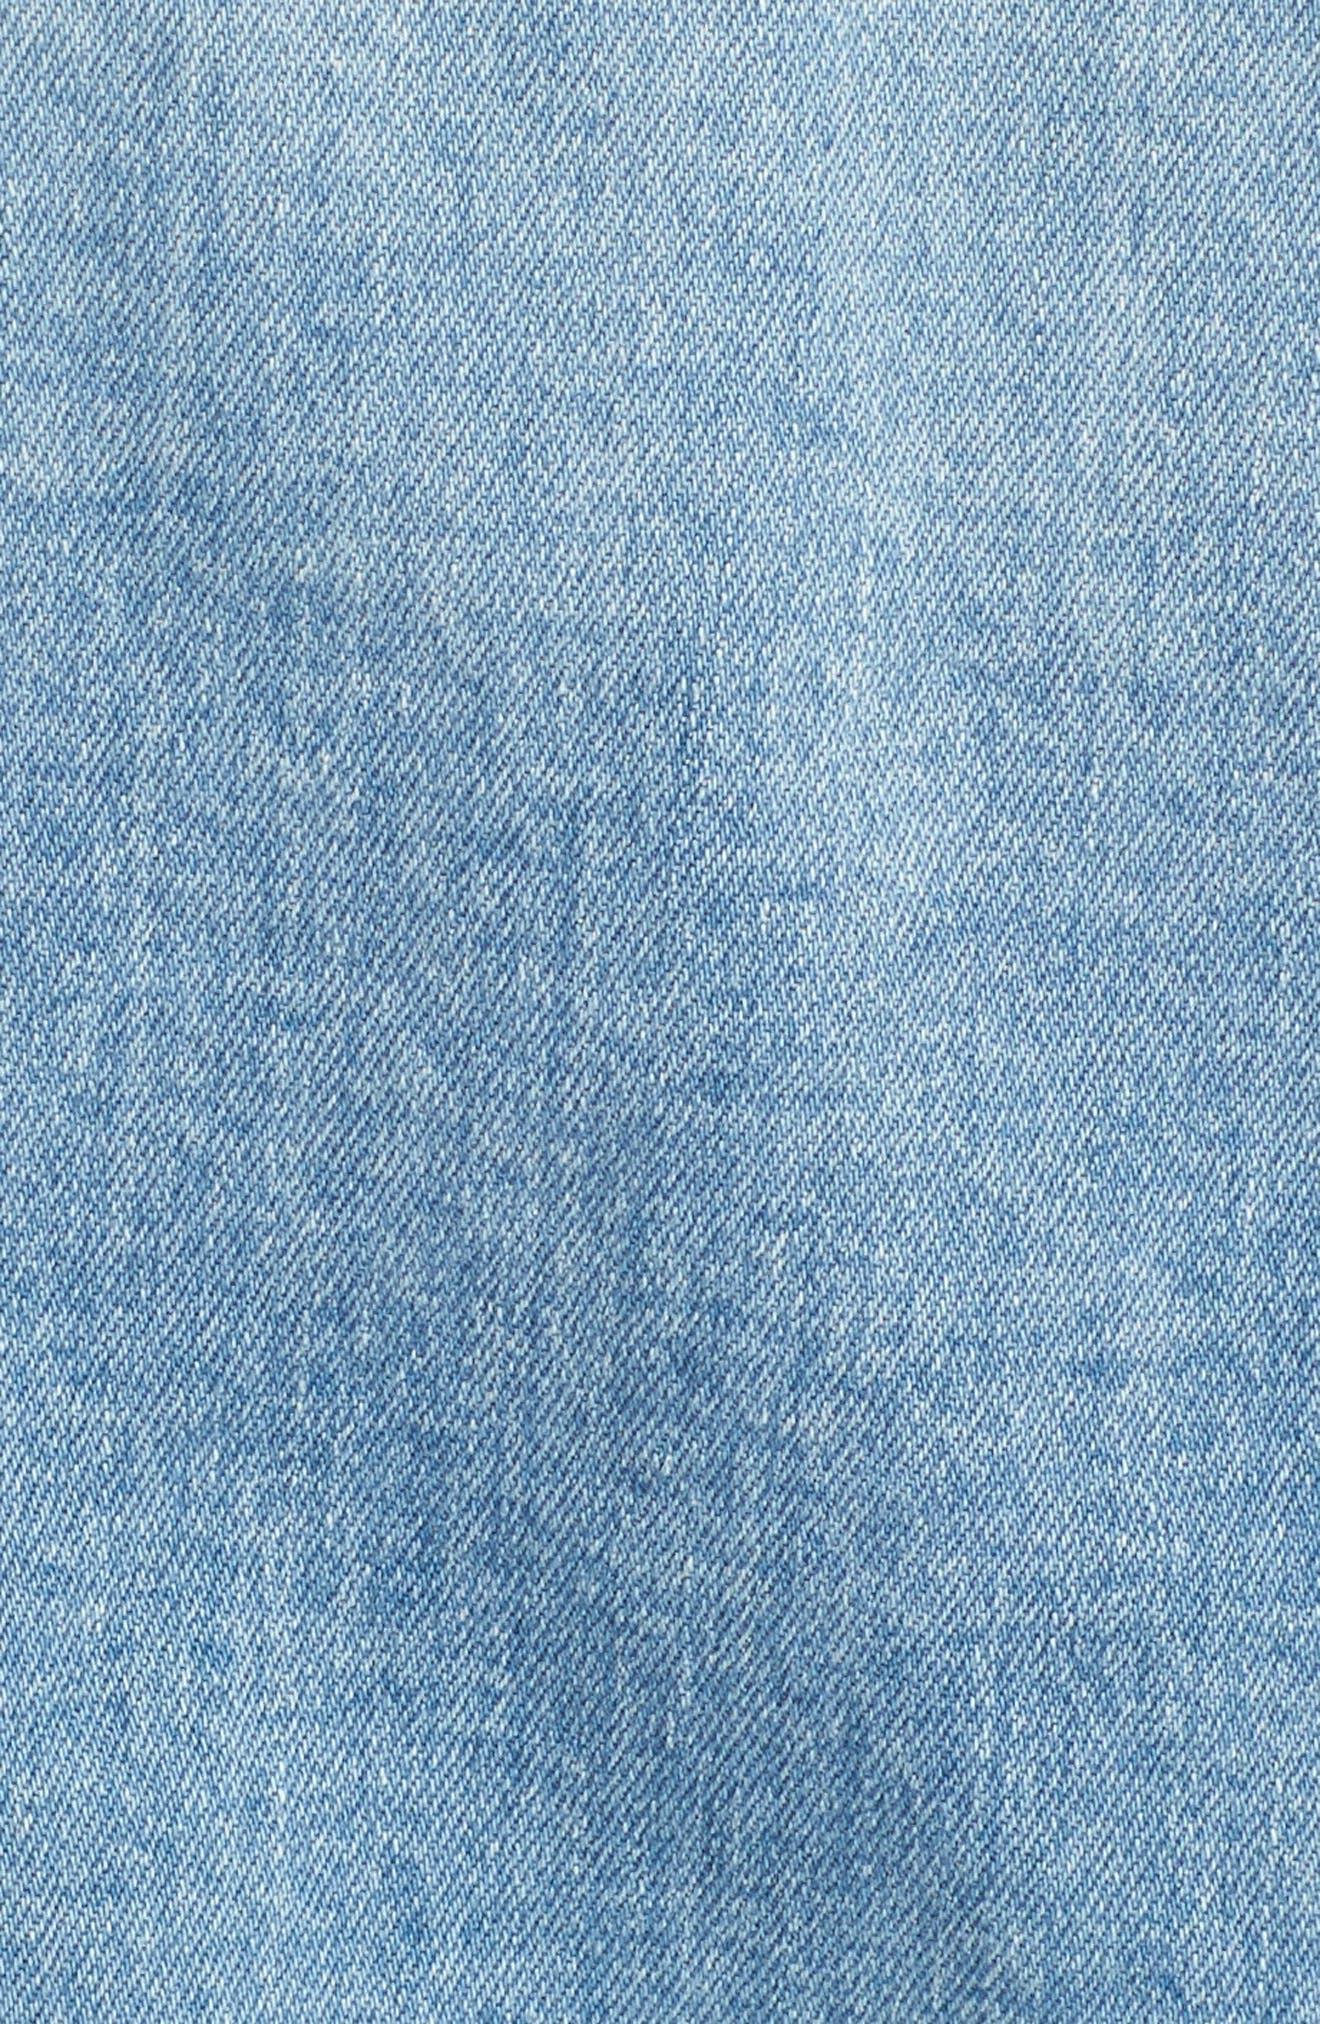 Mya Denim Jacket,                             Alternate thumbnail 5, color,                             Sunlight Blue